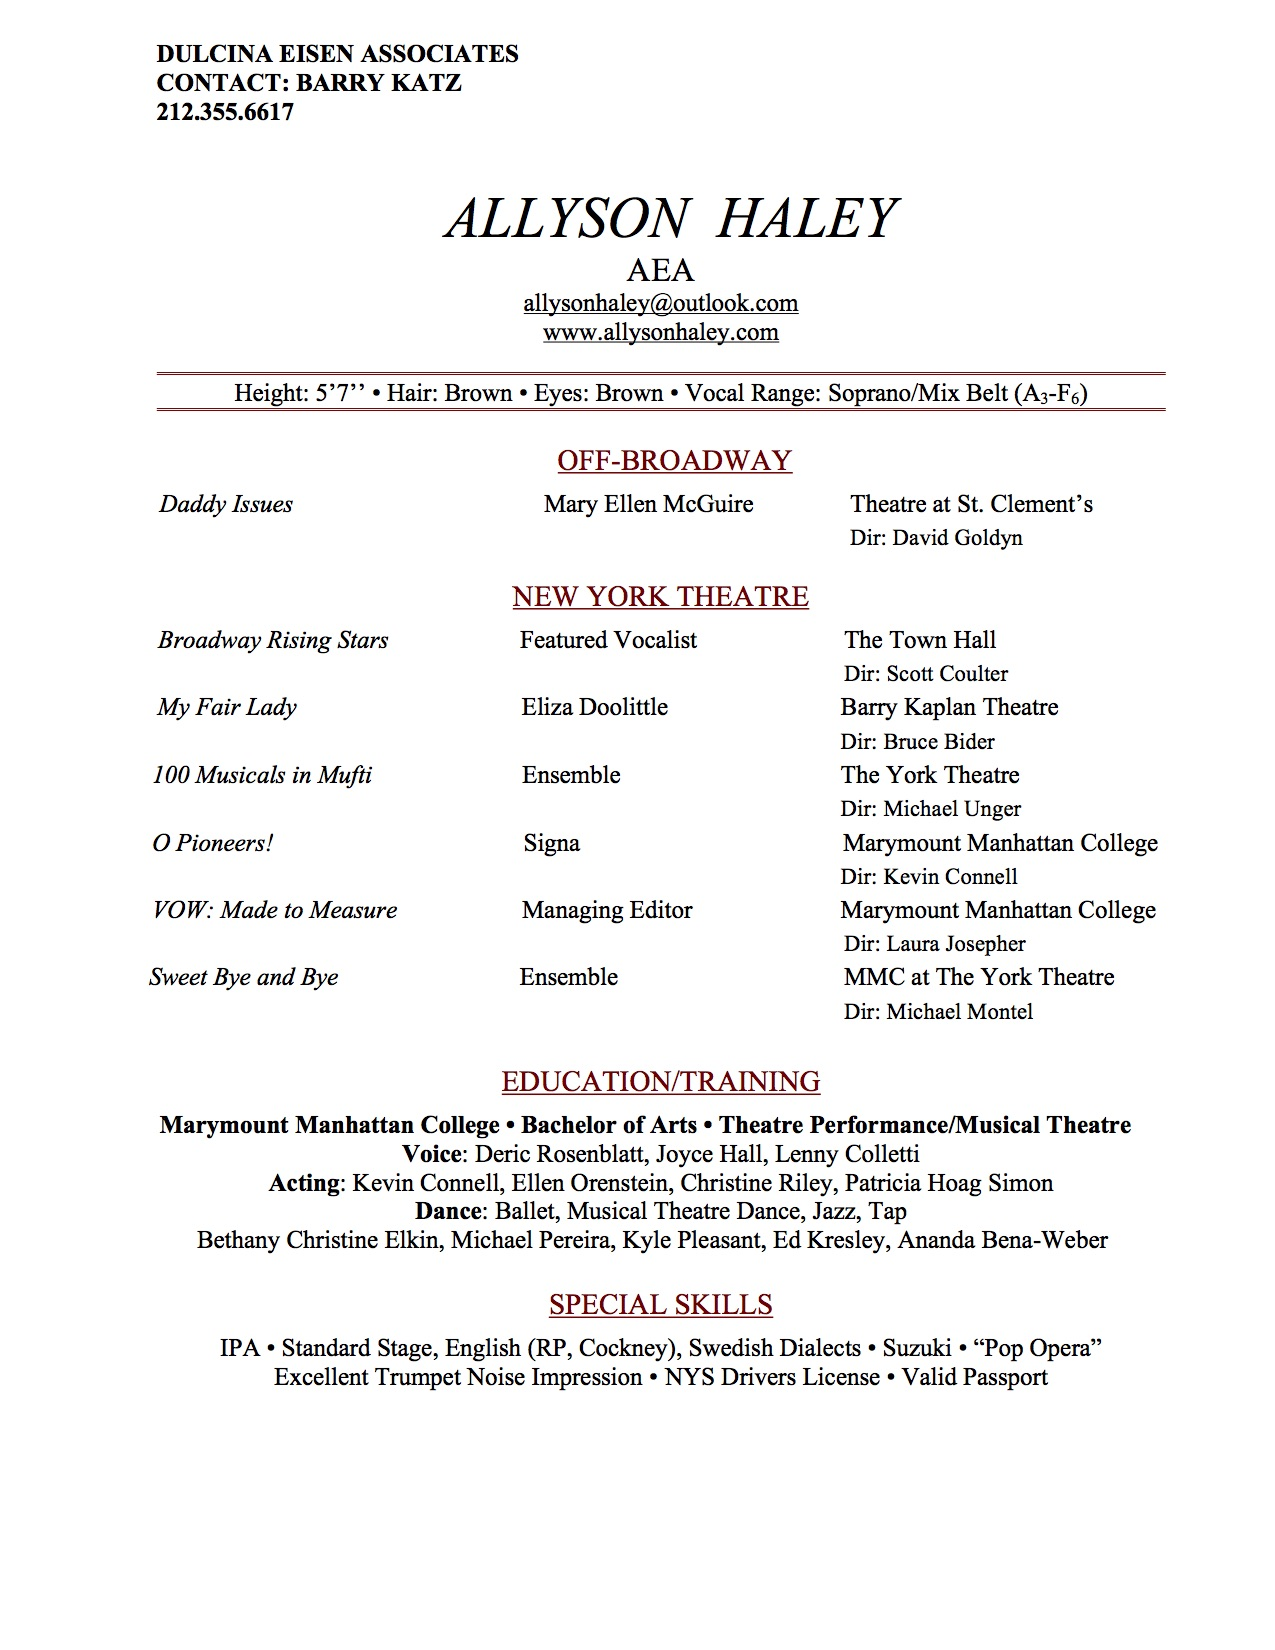 Allyson Haley Resume.jpg